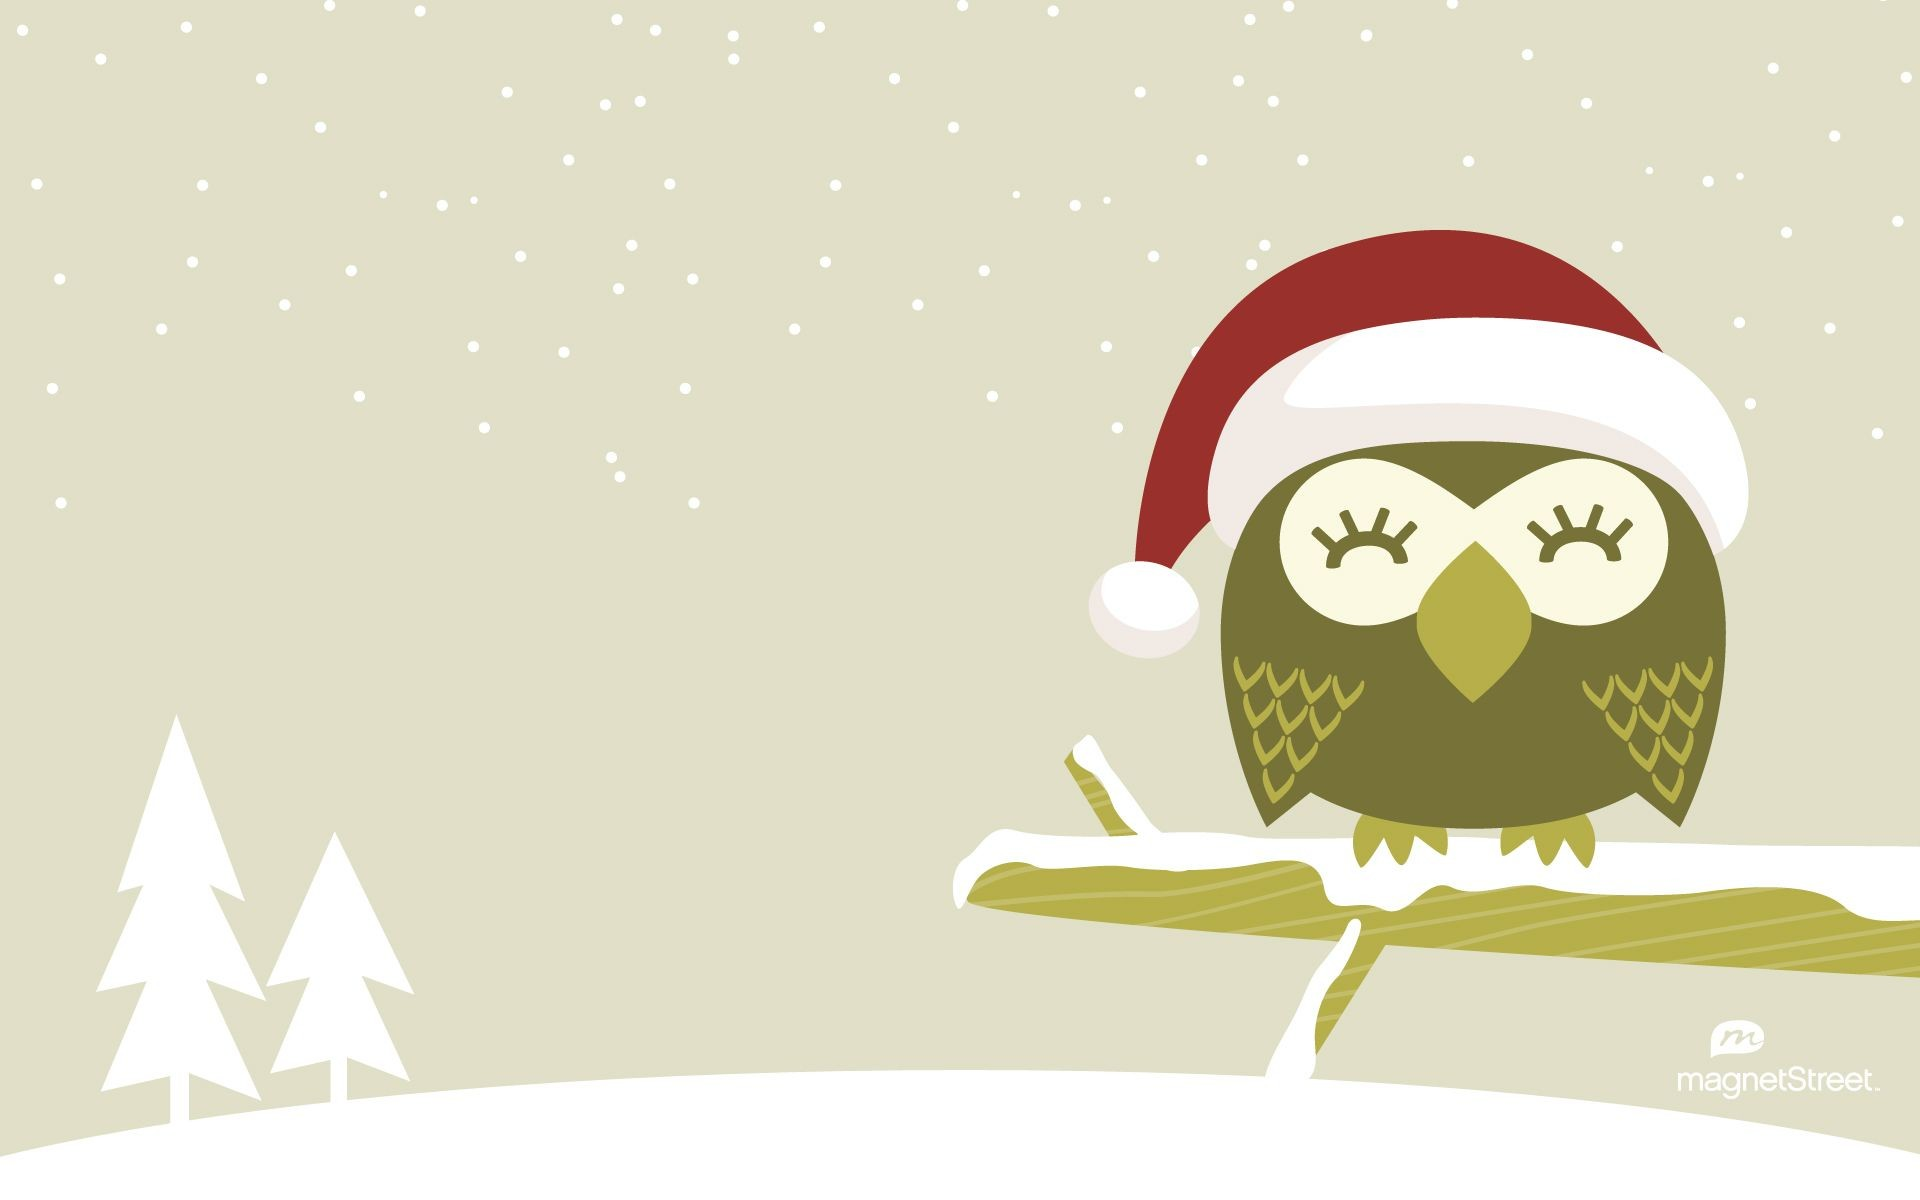 Wallpapers For > Cute Owl Desktop Backgrounds